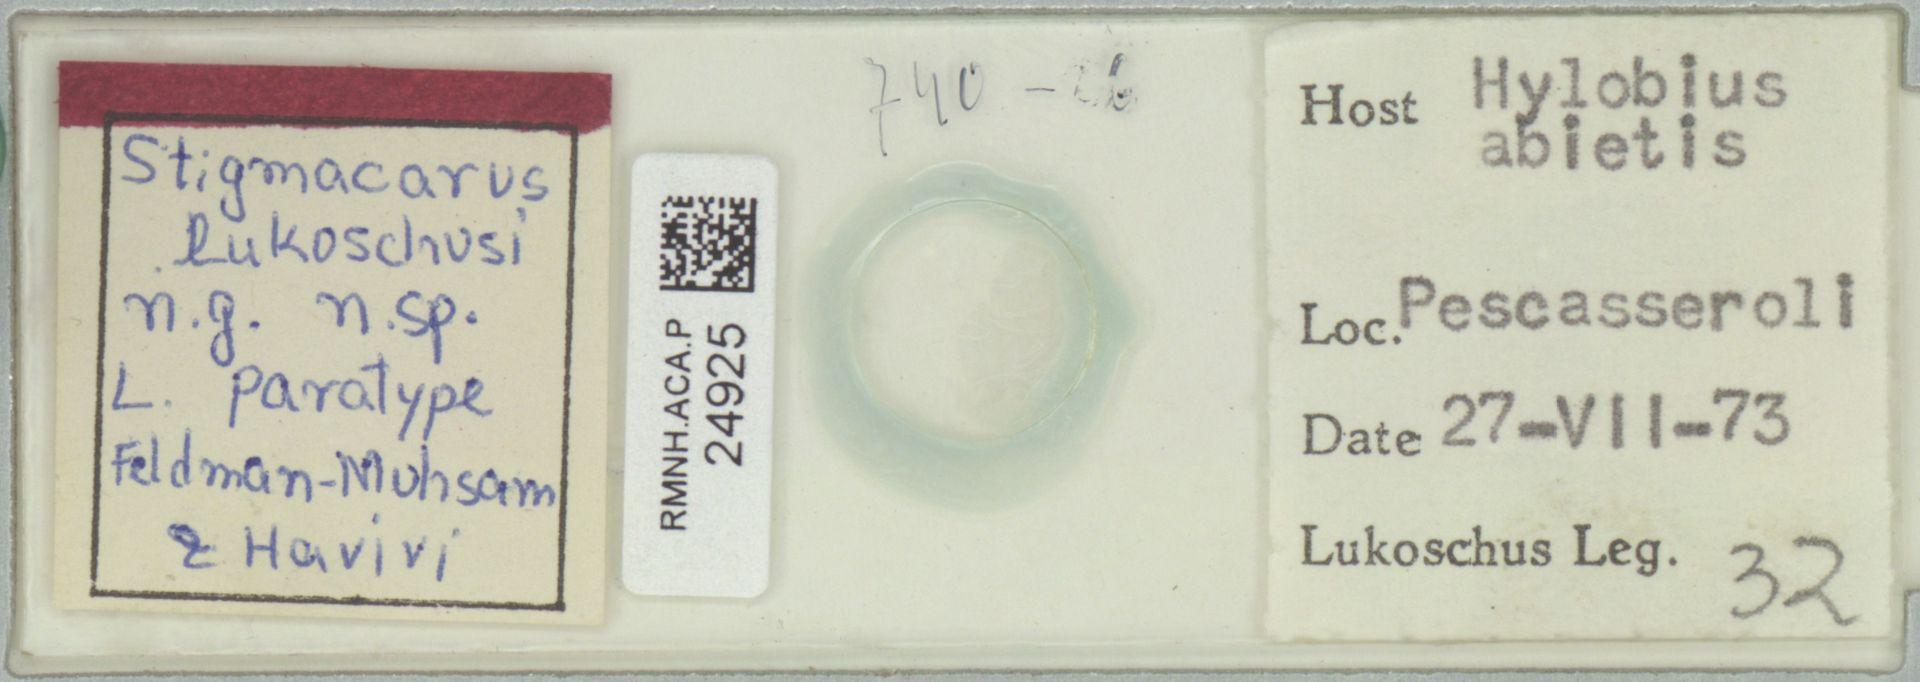 RMNH.ACA.P.24925 | Stigmacarus lukoschusi Feldman-Muhsam & Havivi